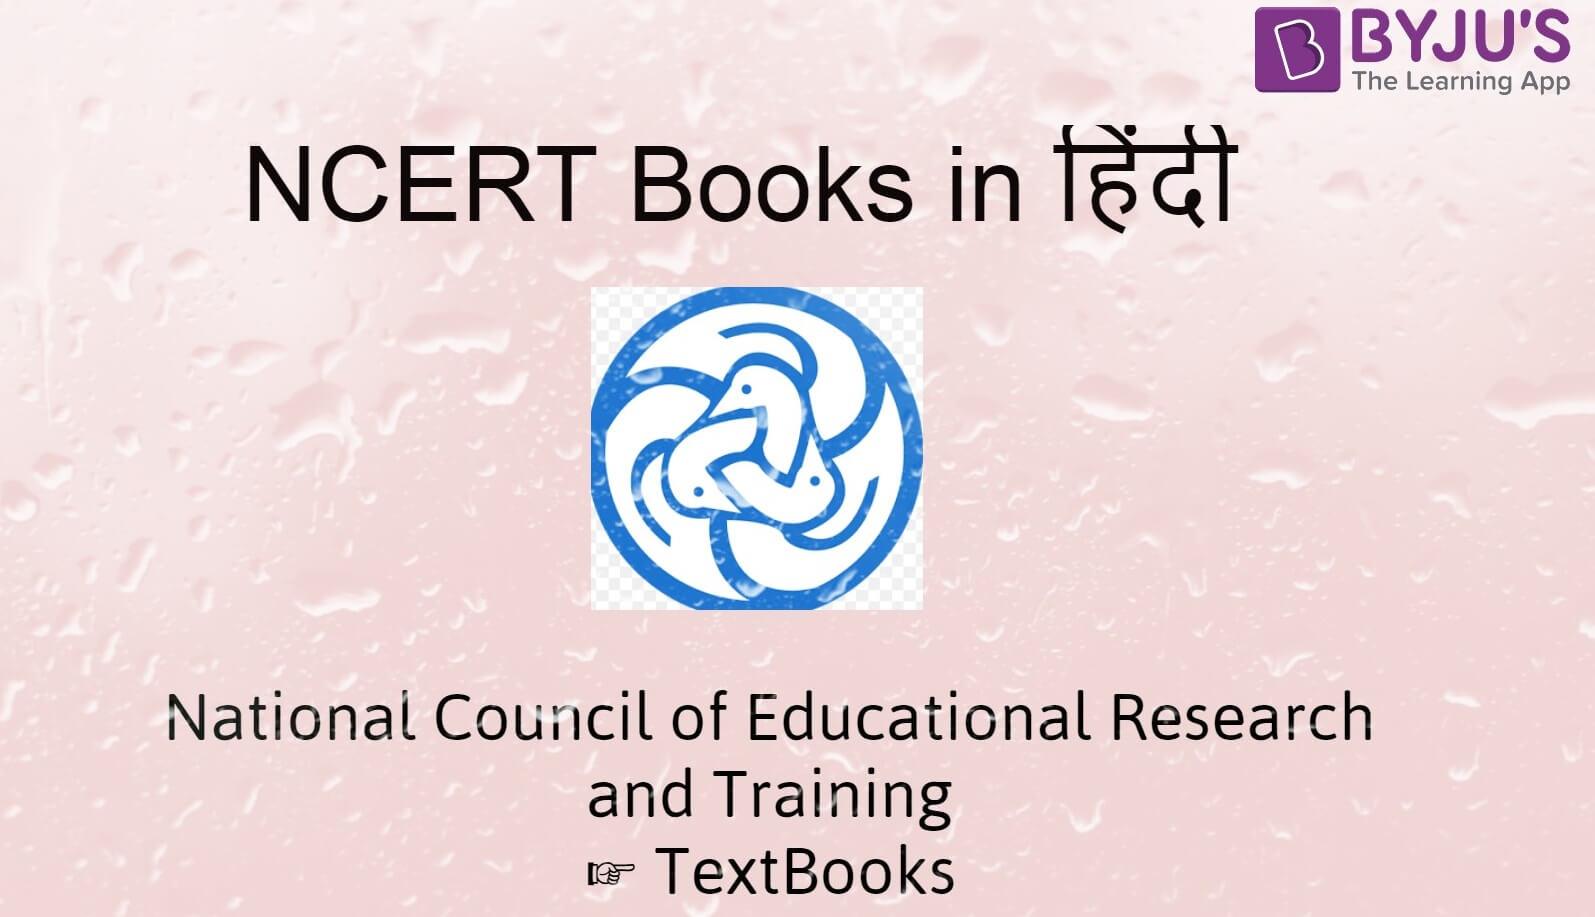 NCERT Books in हिंदी